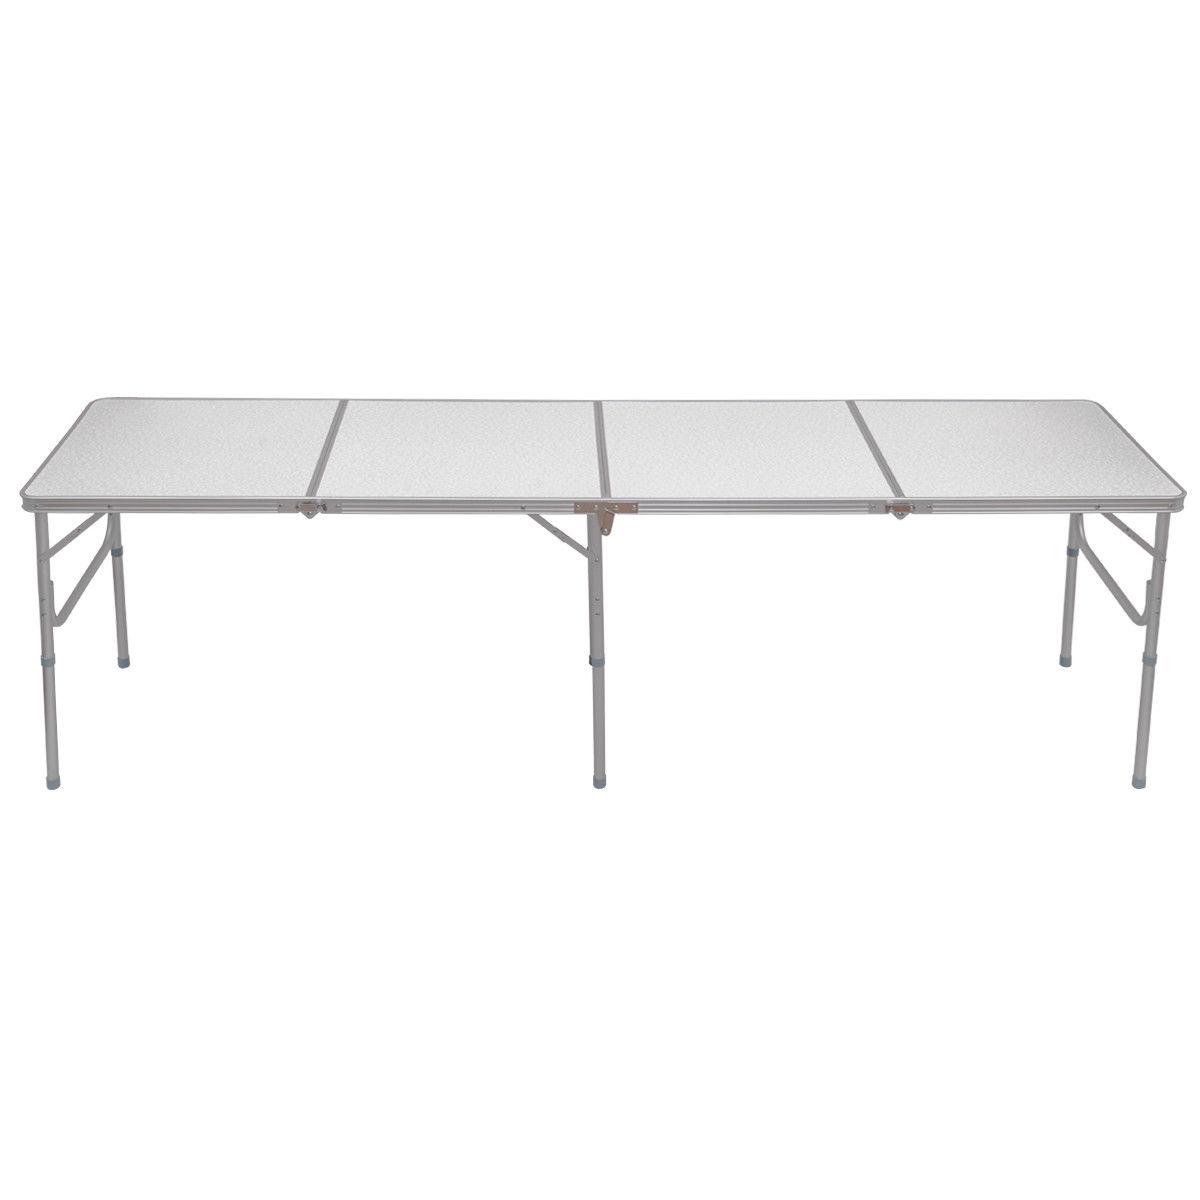 8 ft Aluminum Folding Picnic Camping Table